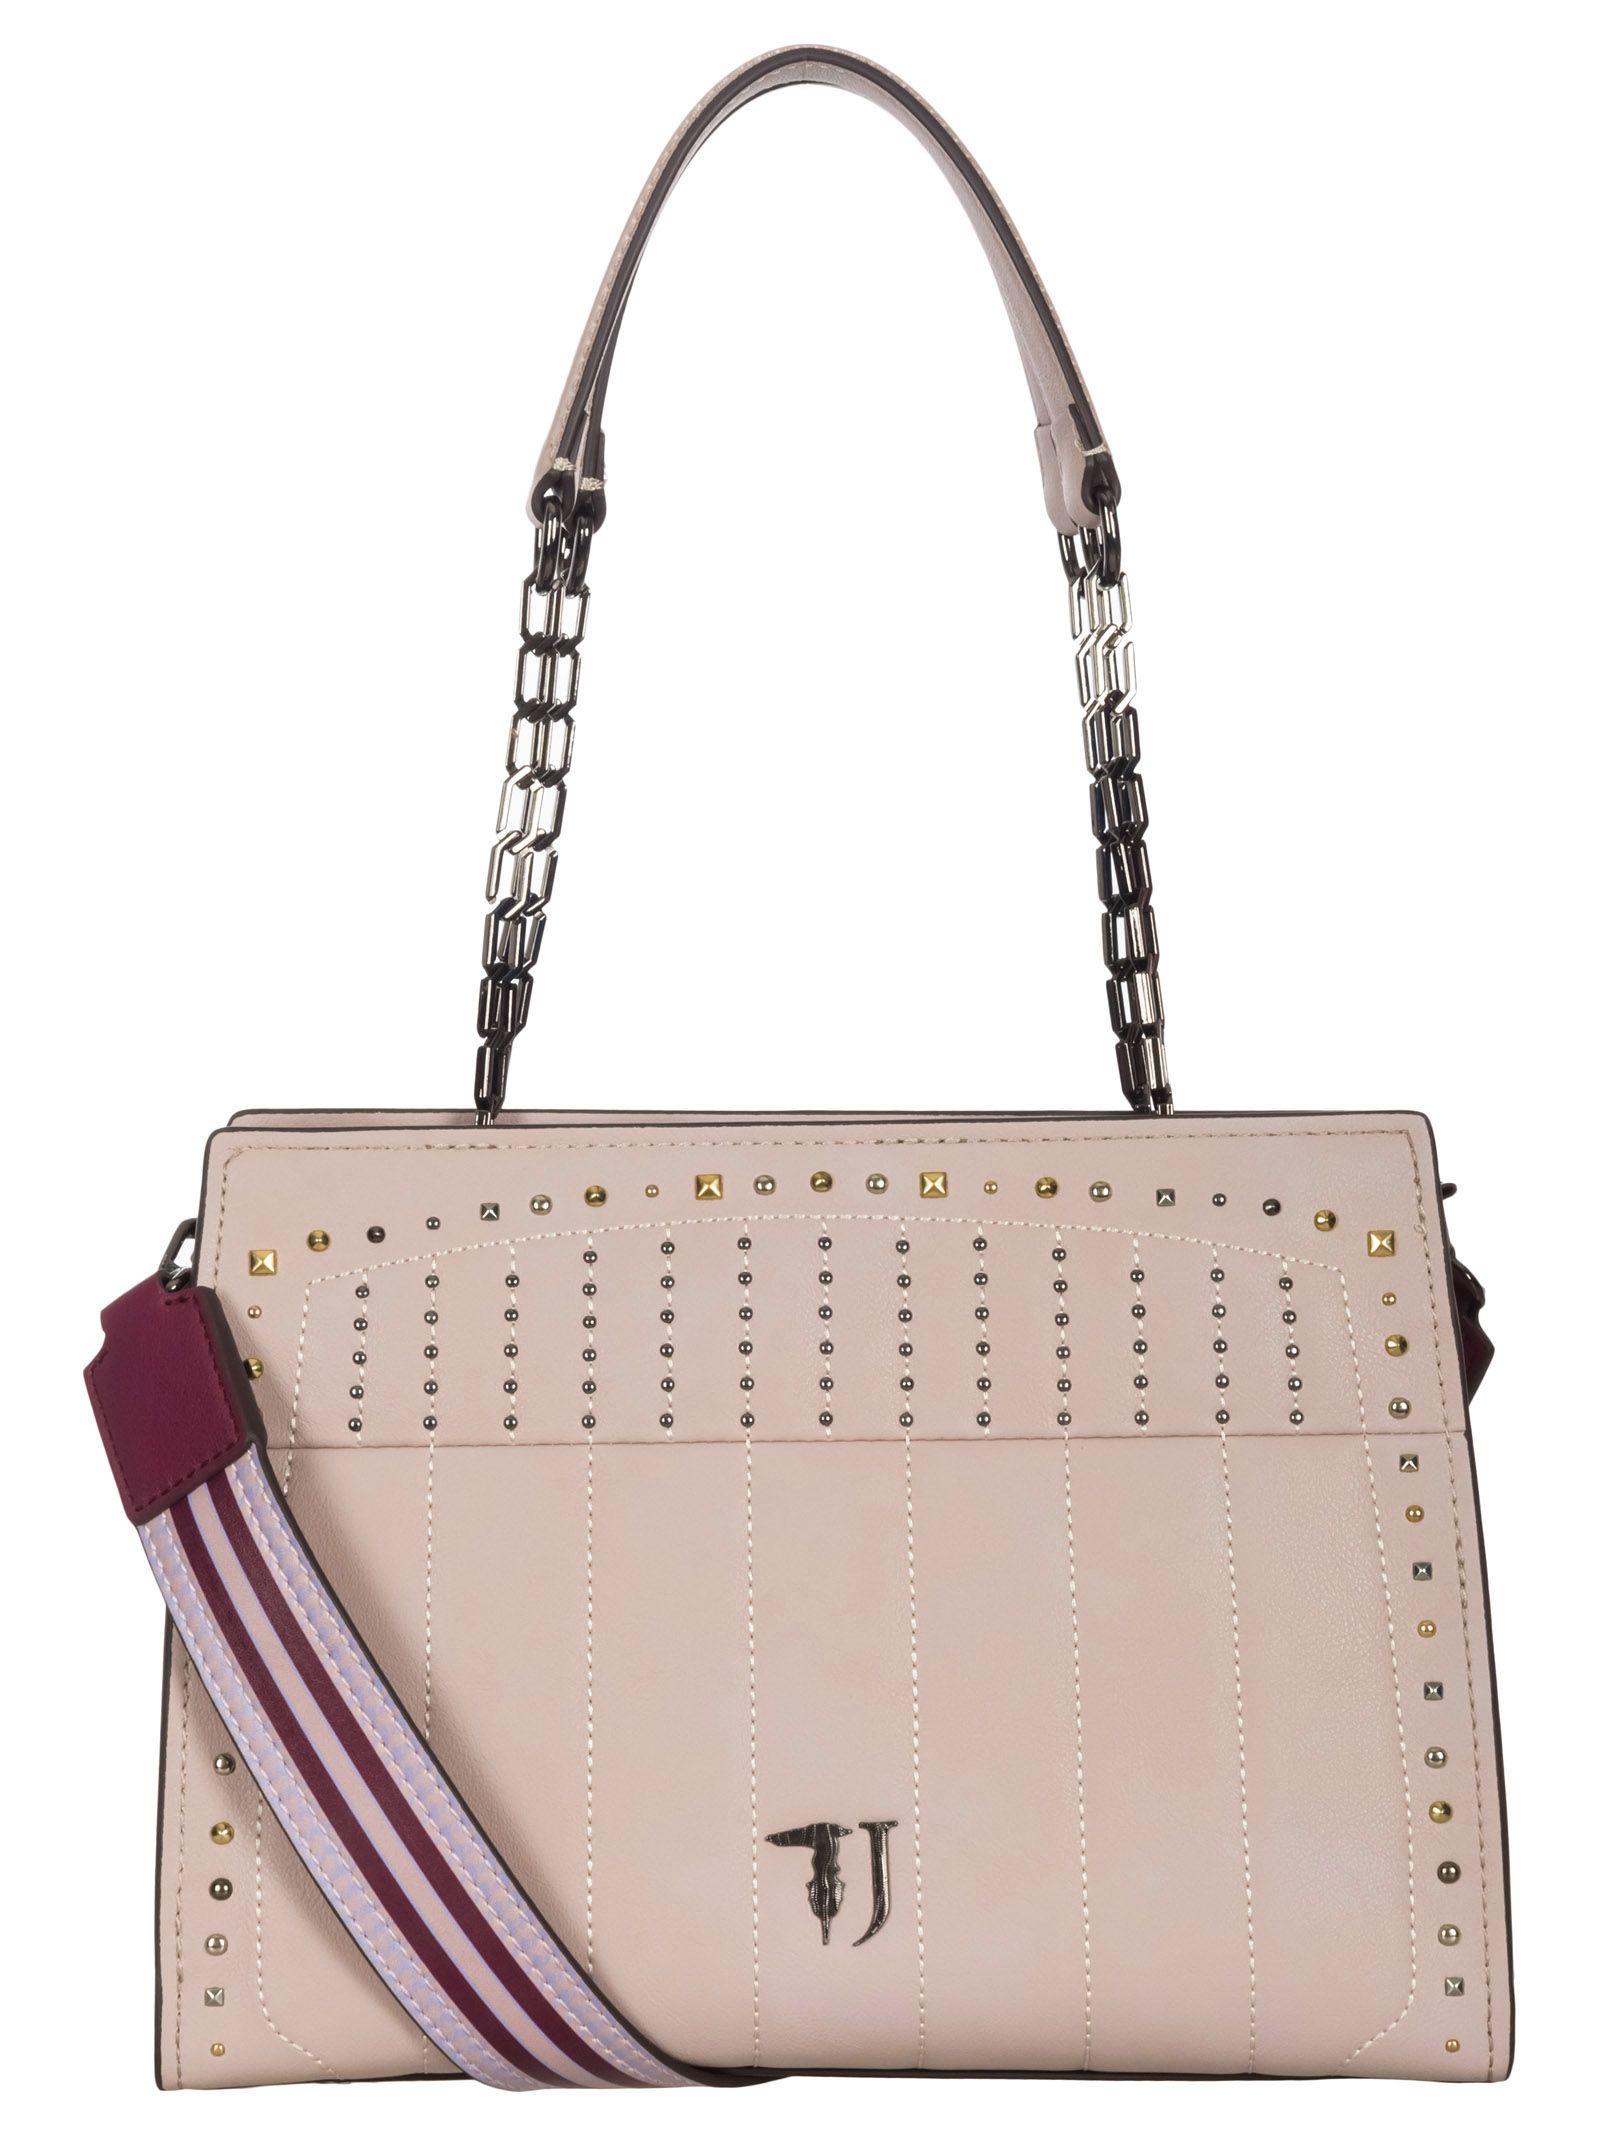 Trussardi Jeans Trussardi Jeans Curcuma Shoulder Bag - Pink ... 1b12d7ef60dc5